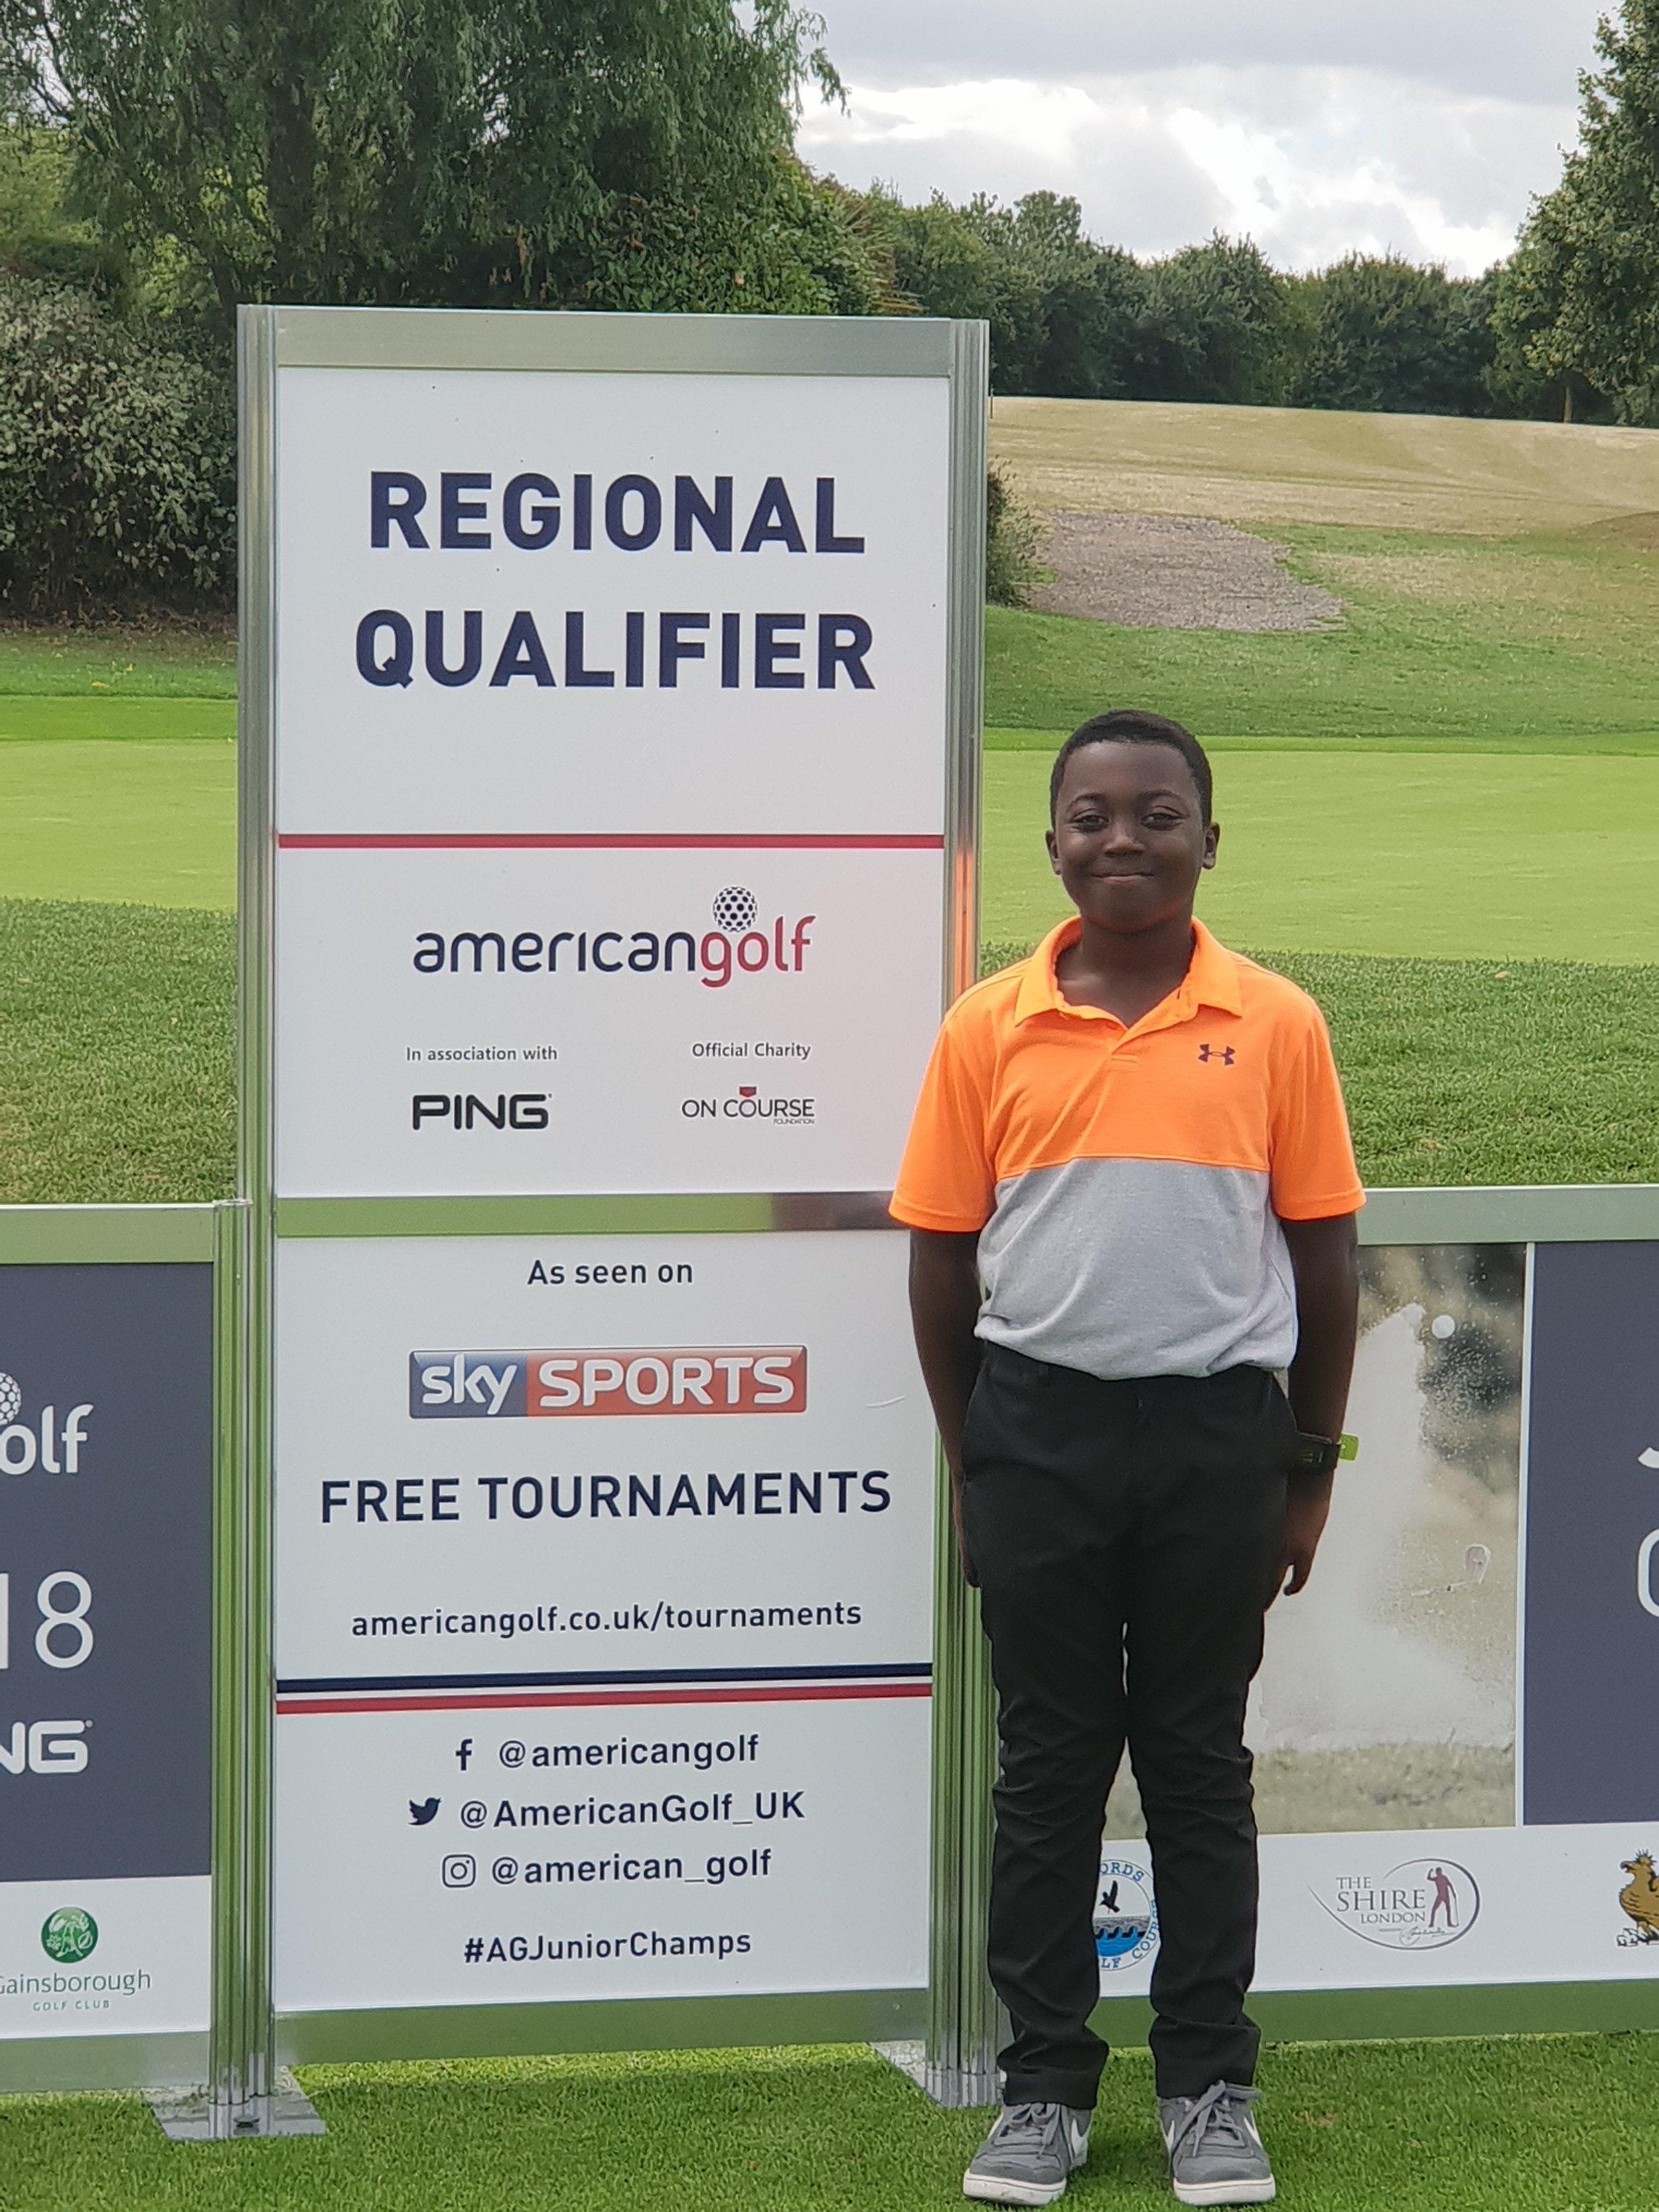 Copy of 2018 'Winner' Regional Qualifier 'Future Stars' 7-8 age group Junior Regional Championships American Golf - Gaudet Luce GC